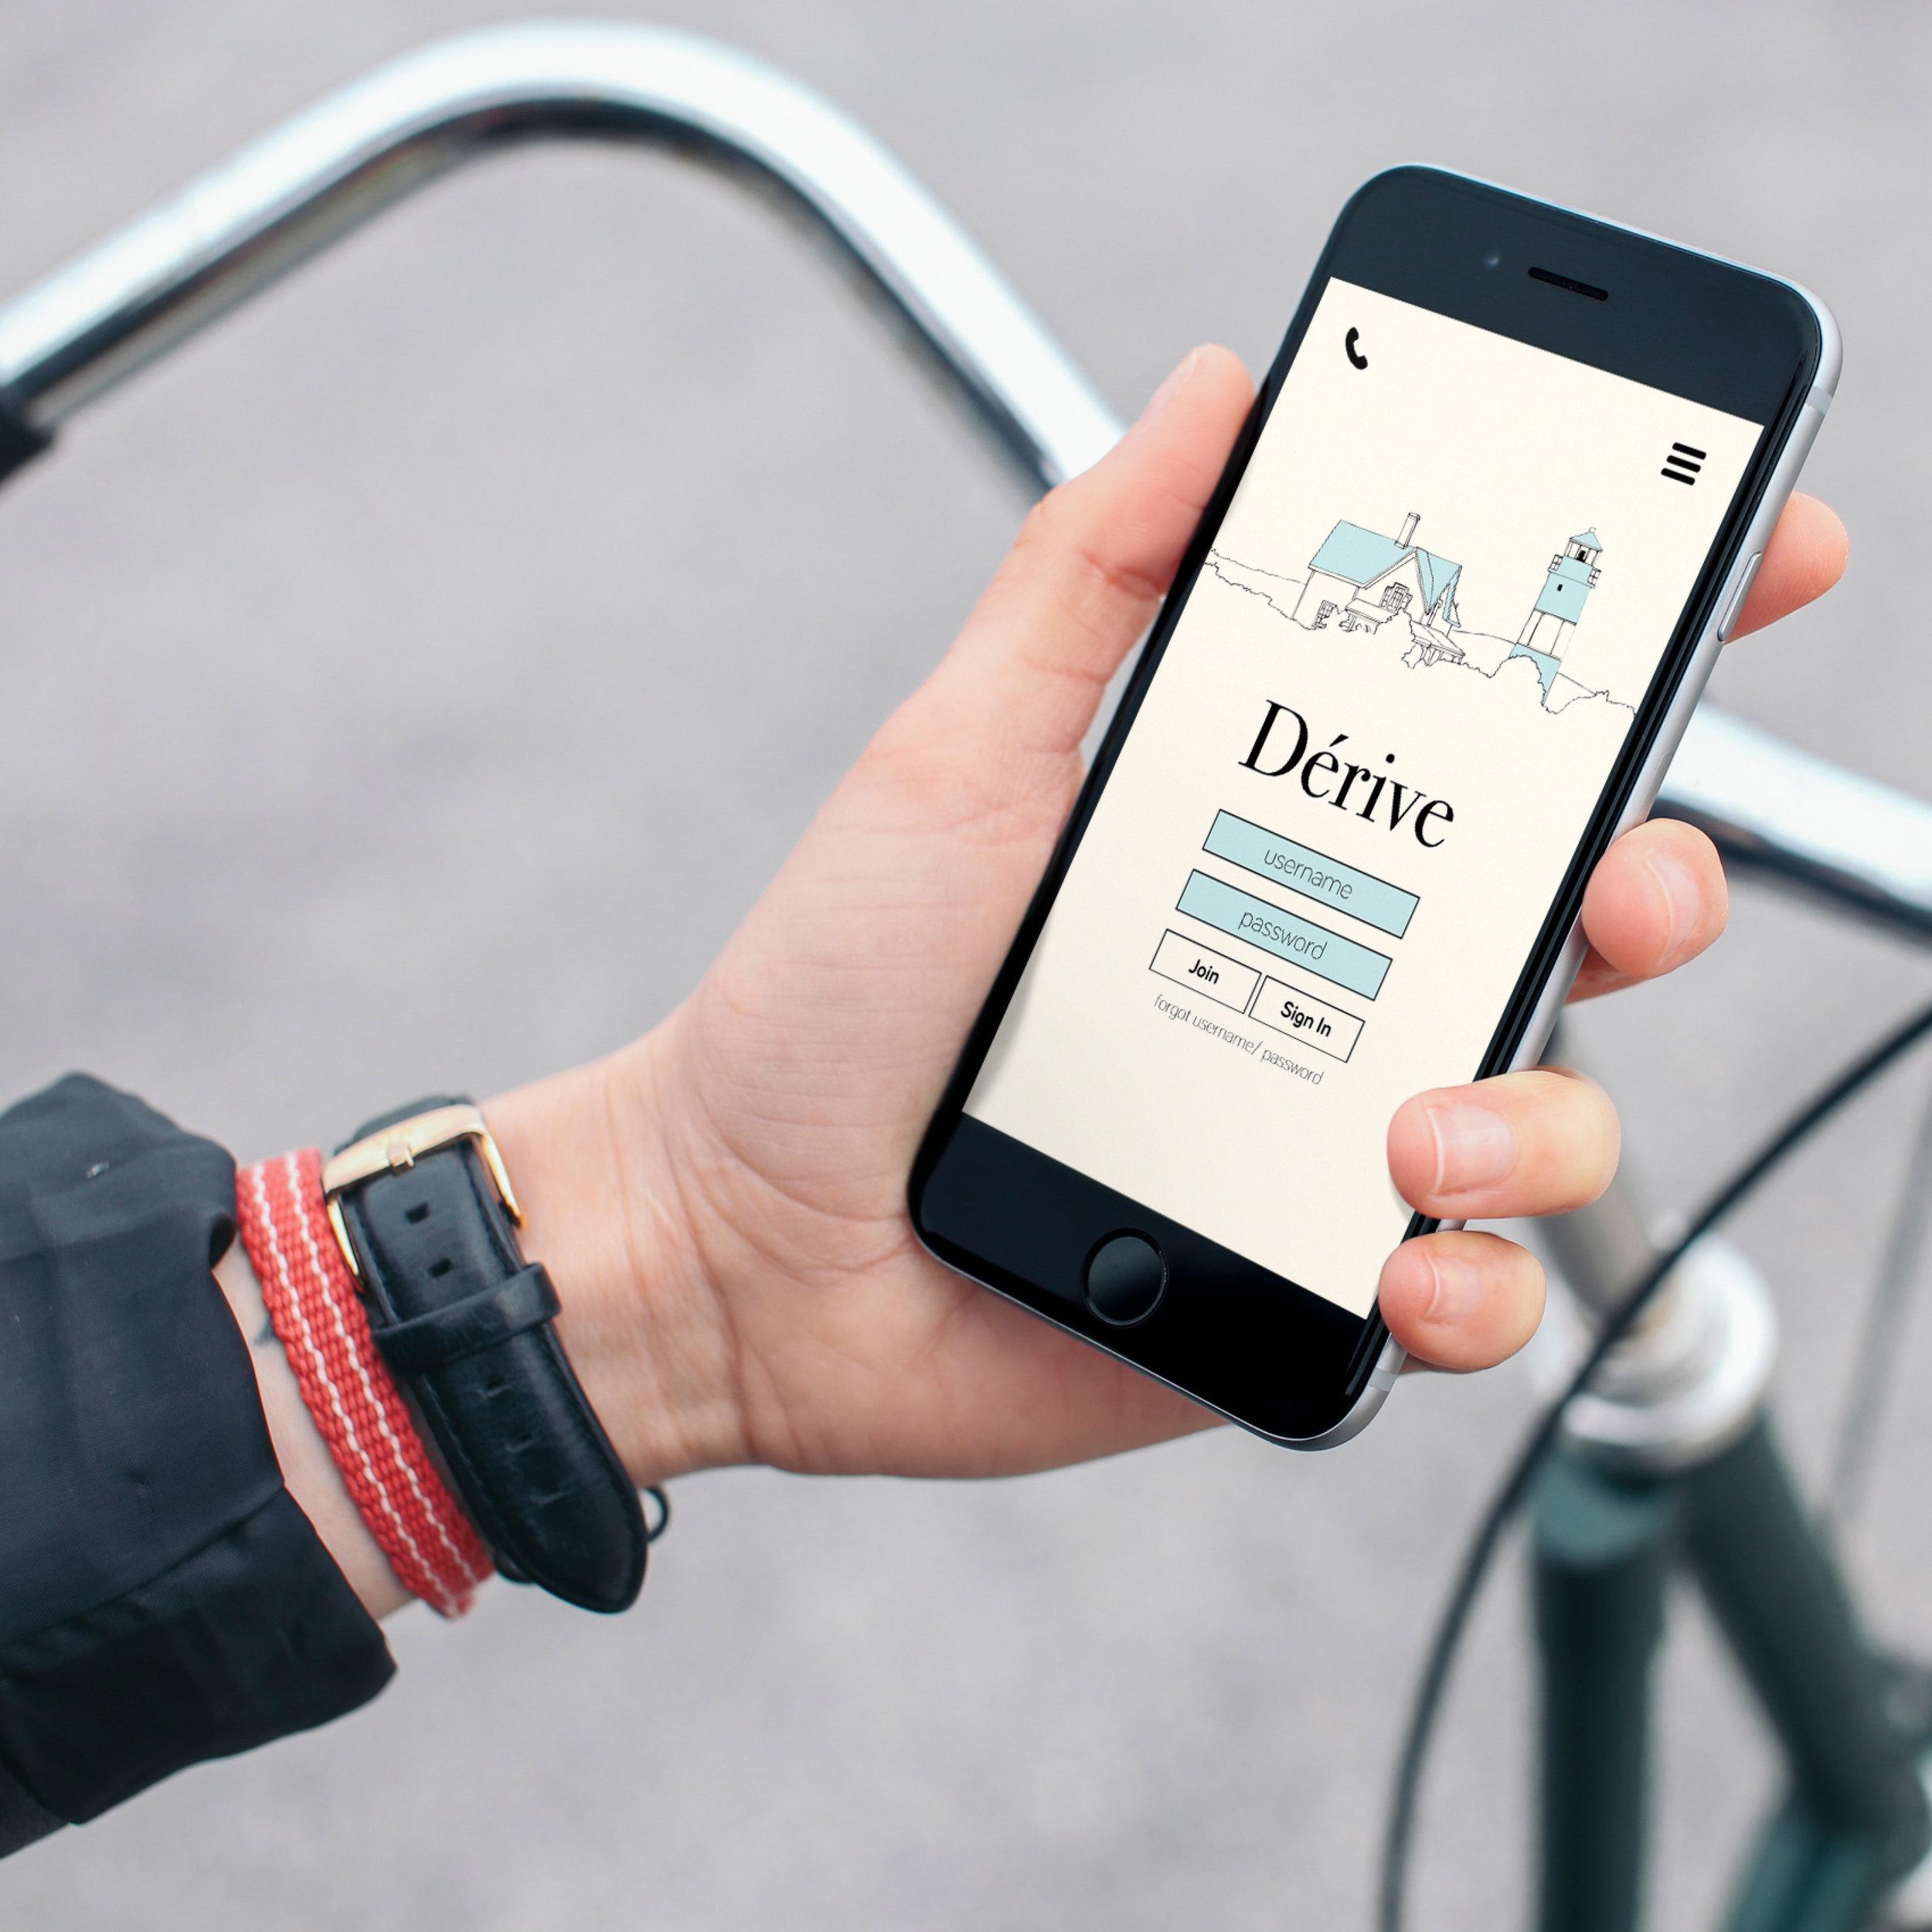 App interface design for Dérive